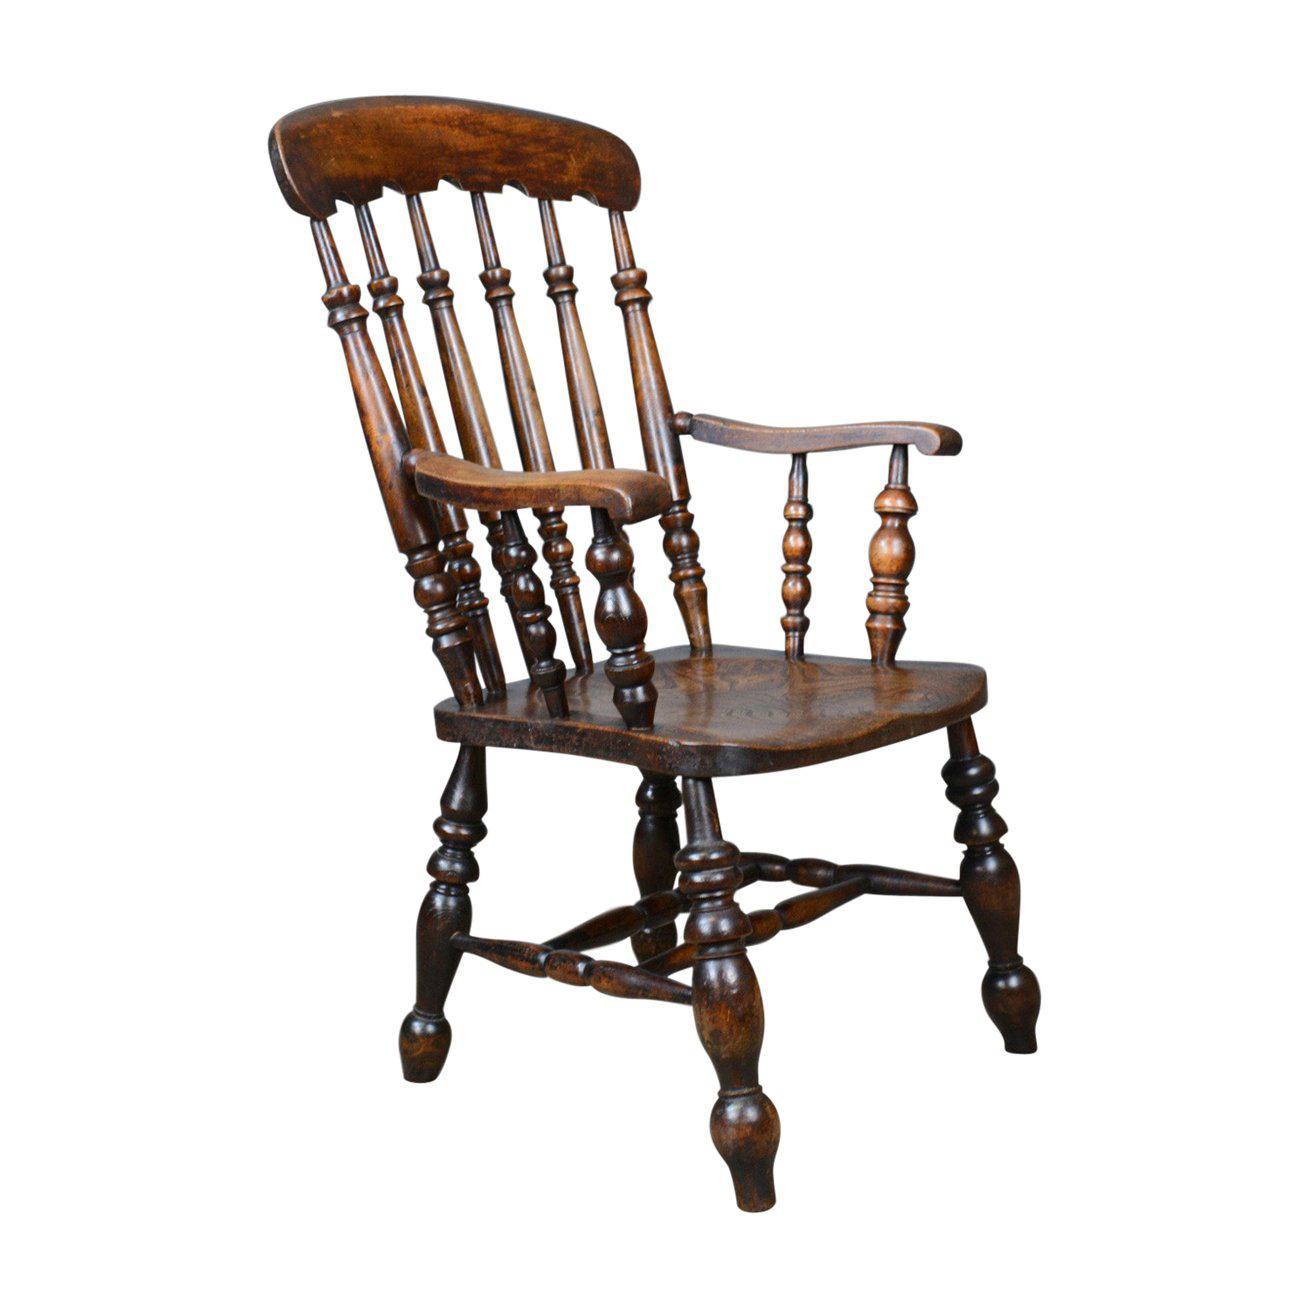 Antique Elbow Chair, English, Victorian, Stick Back Windsor, Elm, circa 1880